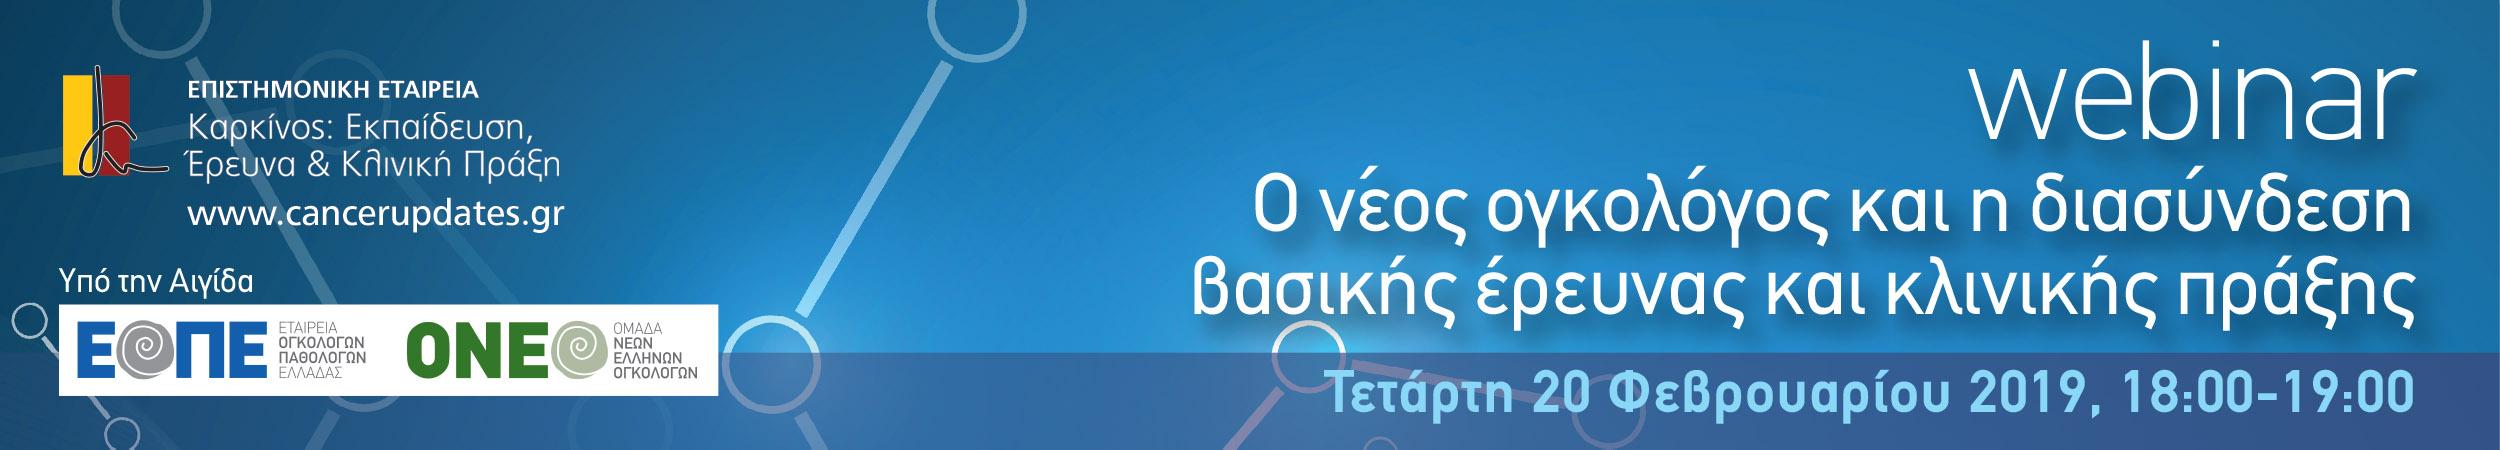 2500_neosogol19